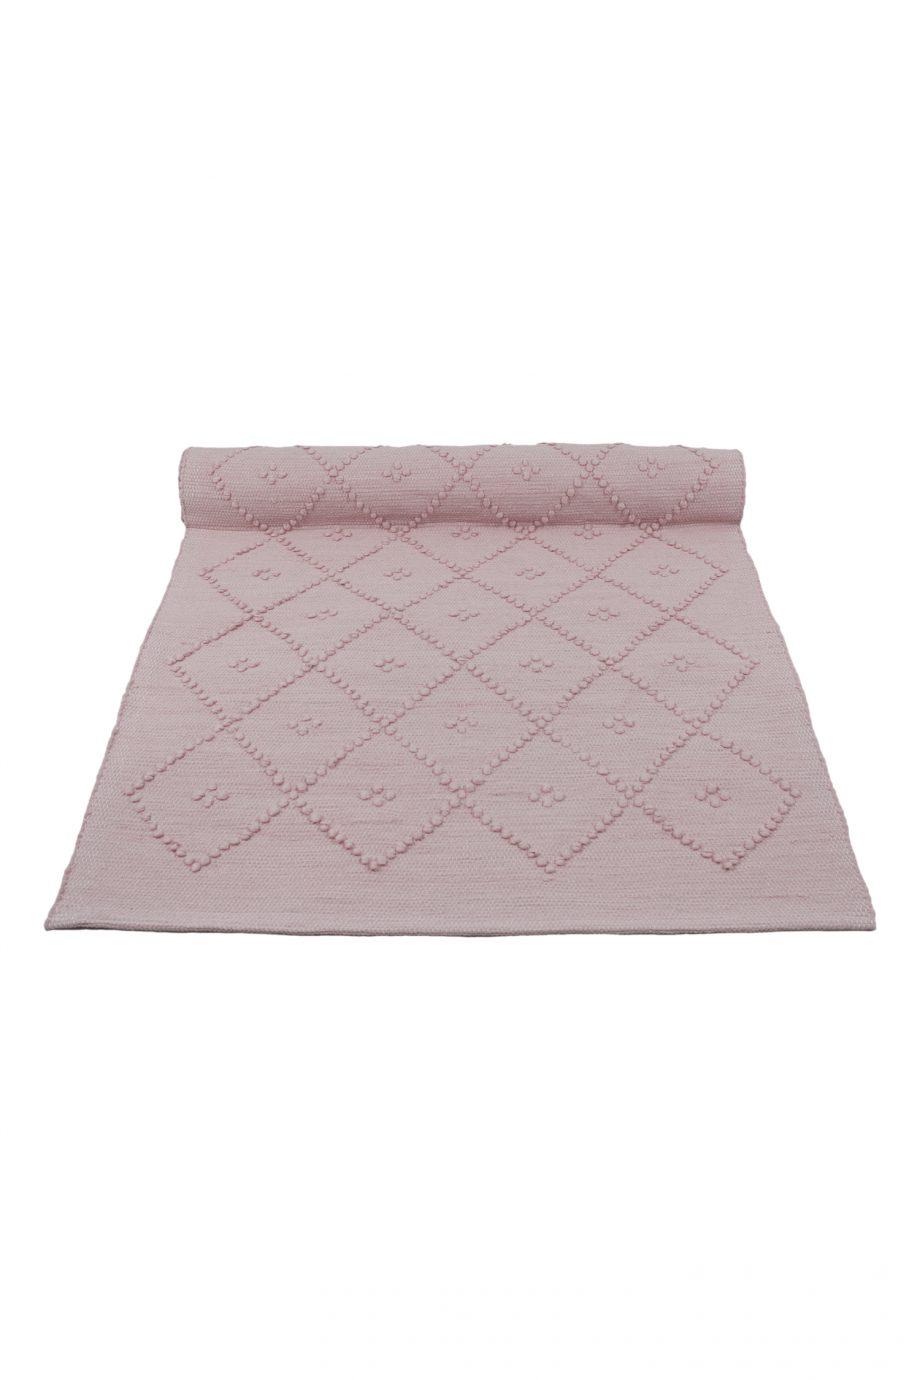 diamond baby roze geweven katoenen kleedje small